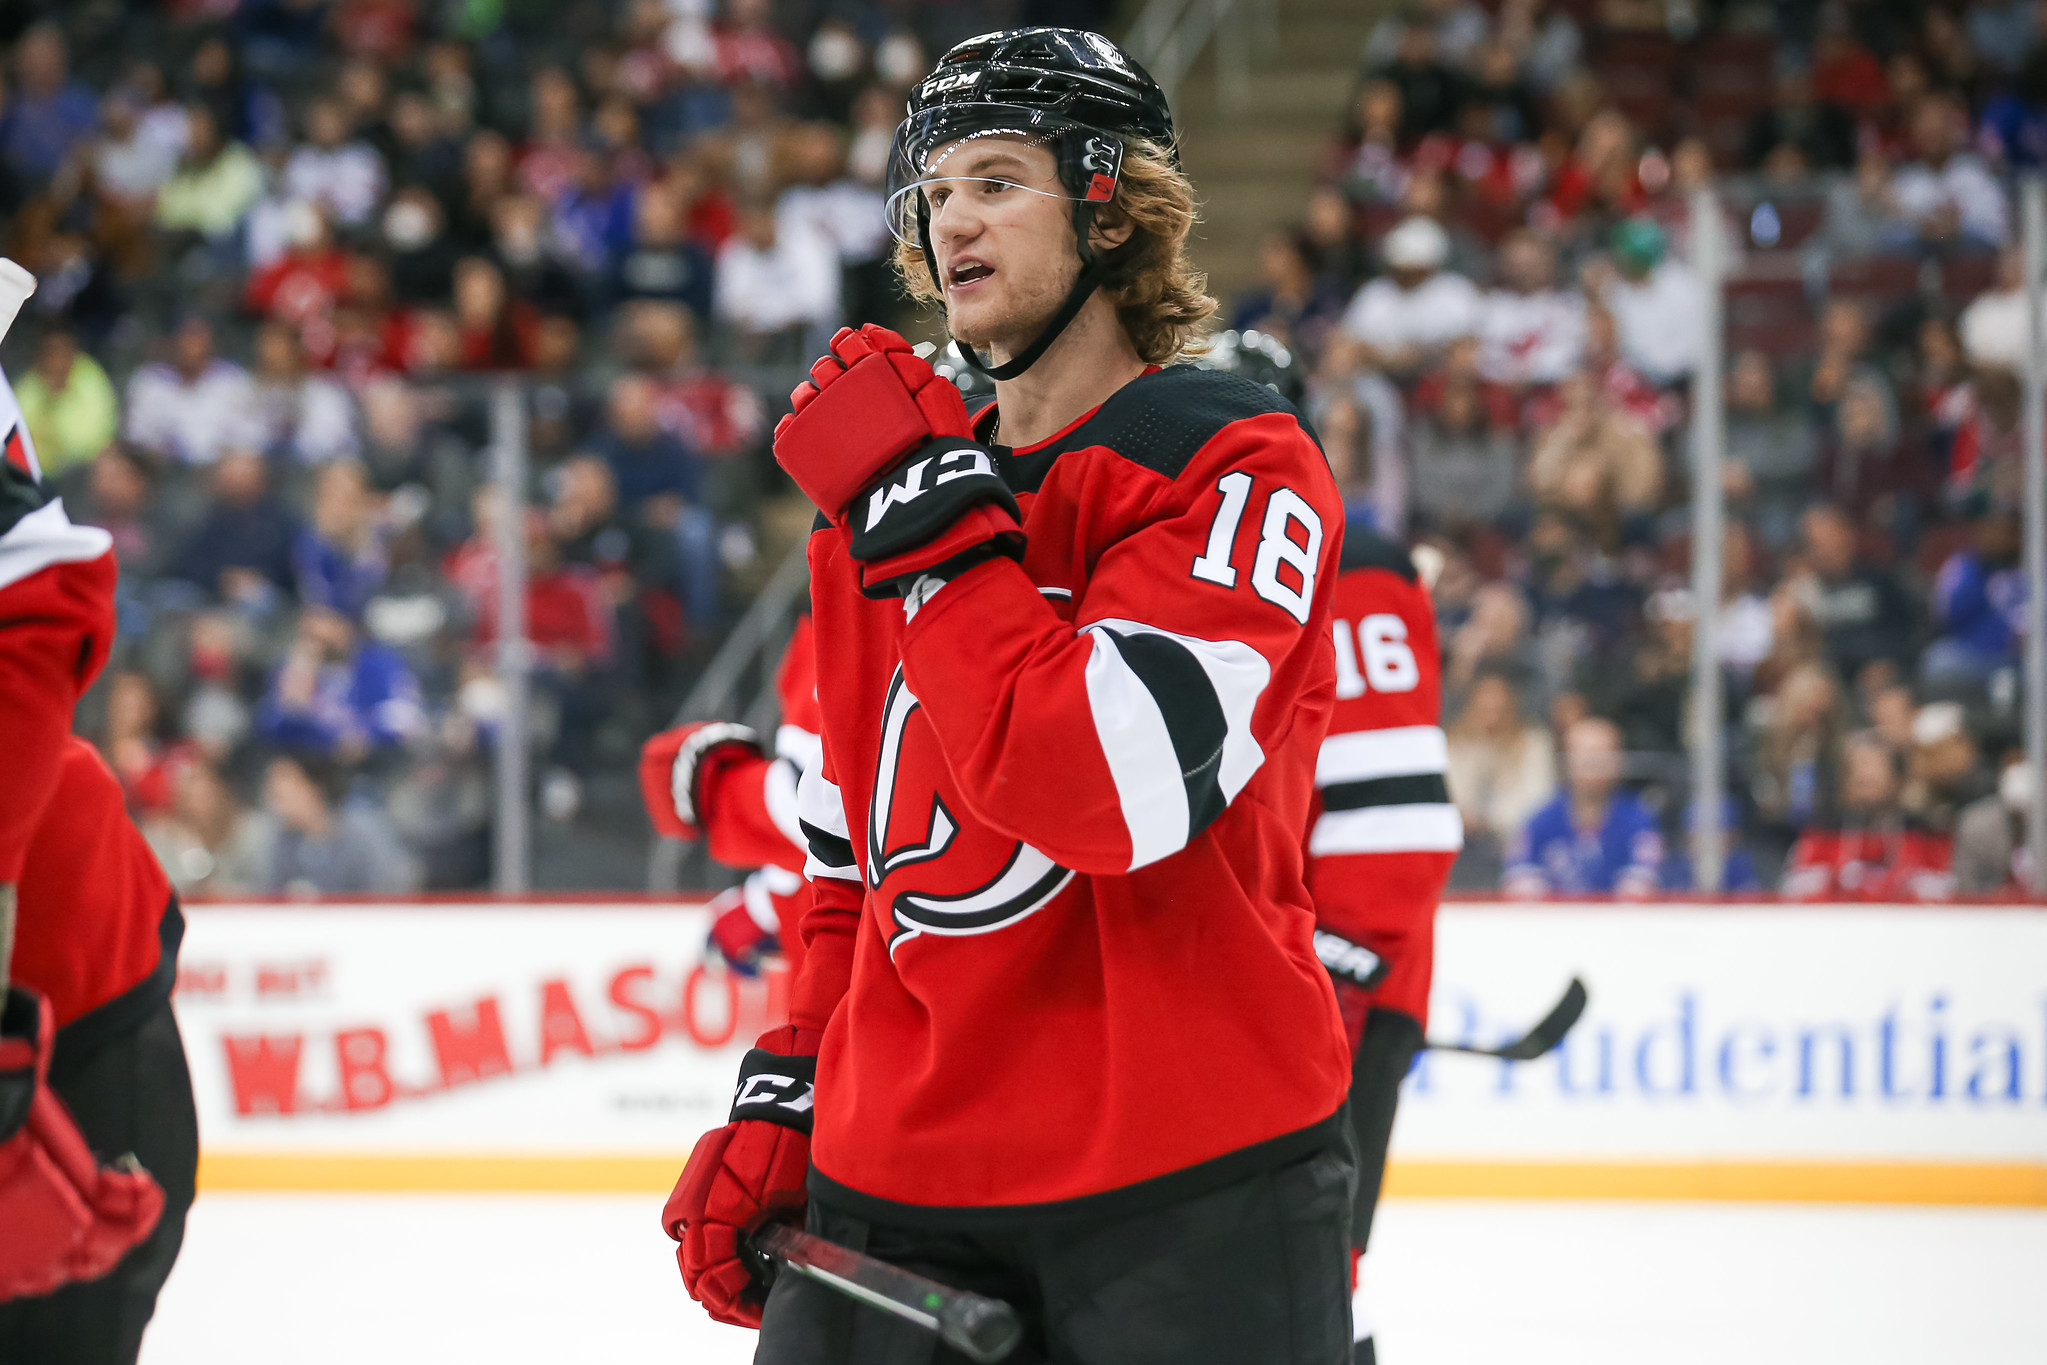 Devils' Dawson Mercer Having an Impact on & off the Ice